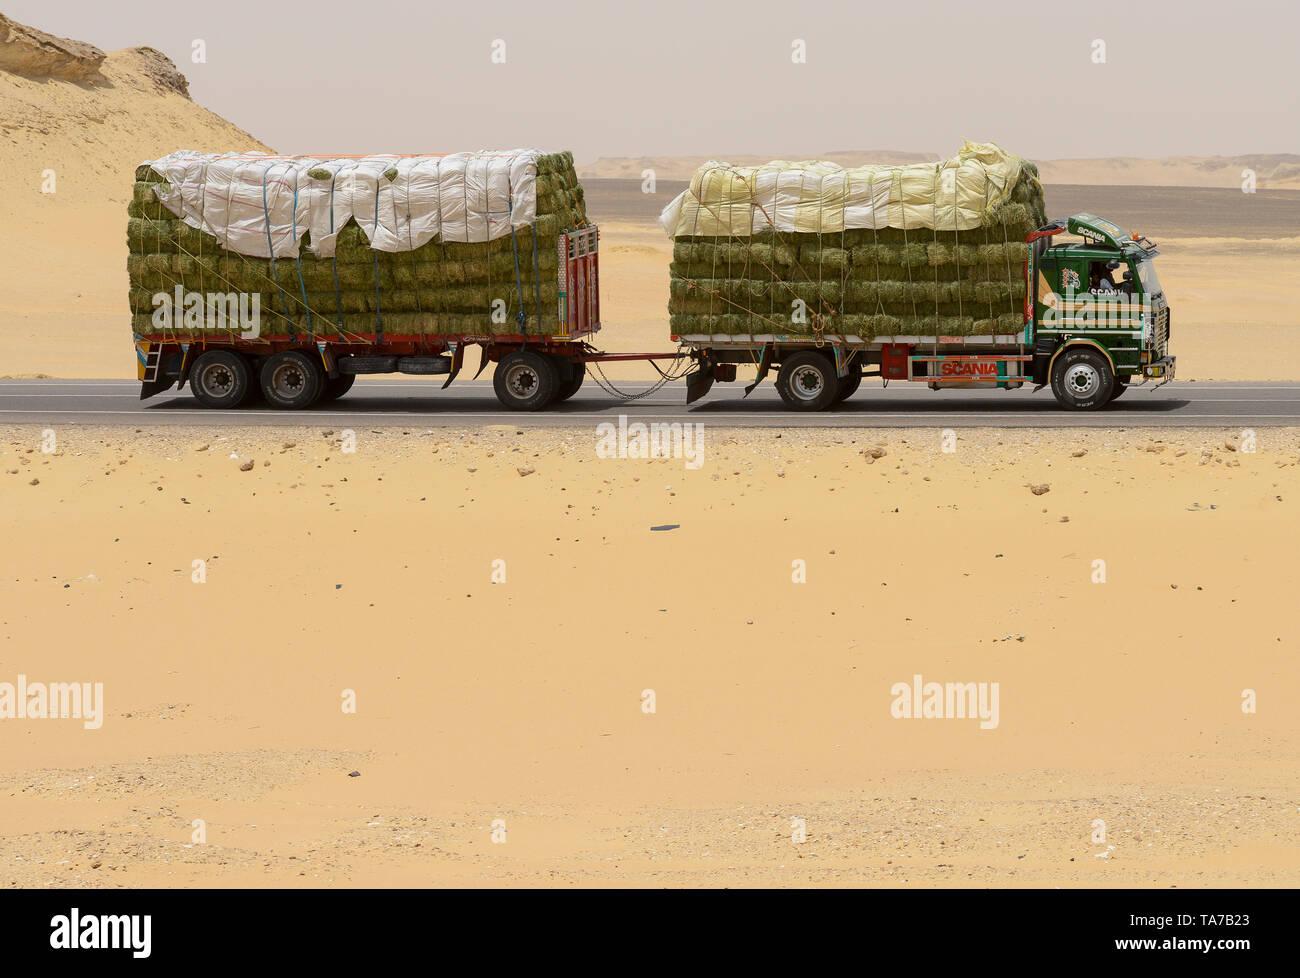 EGYPT, Farafra, truck transport hay for animal feed from large desert farms for export to Saudi Arabia / AEGYPTEN, Farafra, LKW transportiert Heu aus grossen Wuestenfarmen als Tierfutter fuer Export nach Saudi Arabien - Stock Image